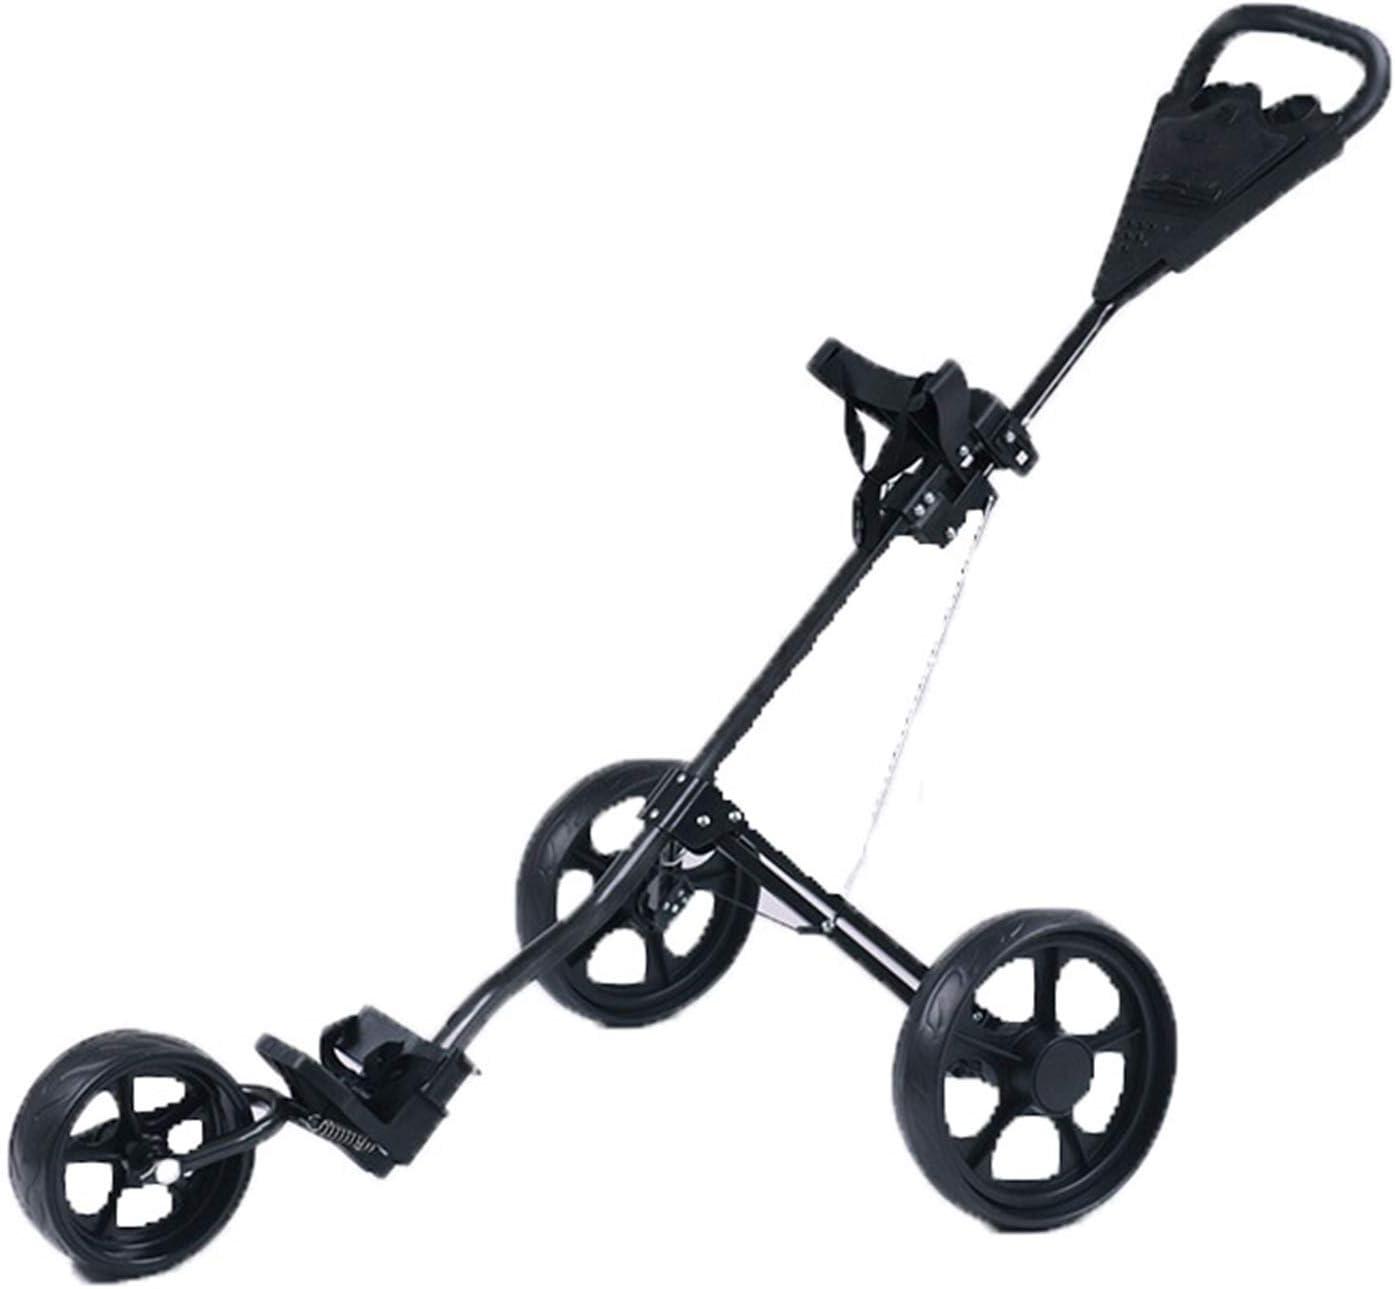 Golf Push Cart Foldable 3 4 years warranty Lightweigh Carts Philadelphia Mall Wheels